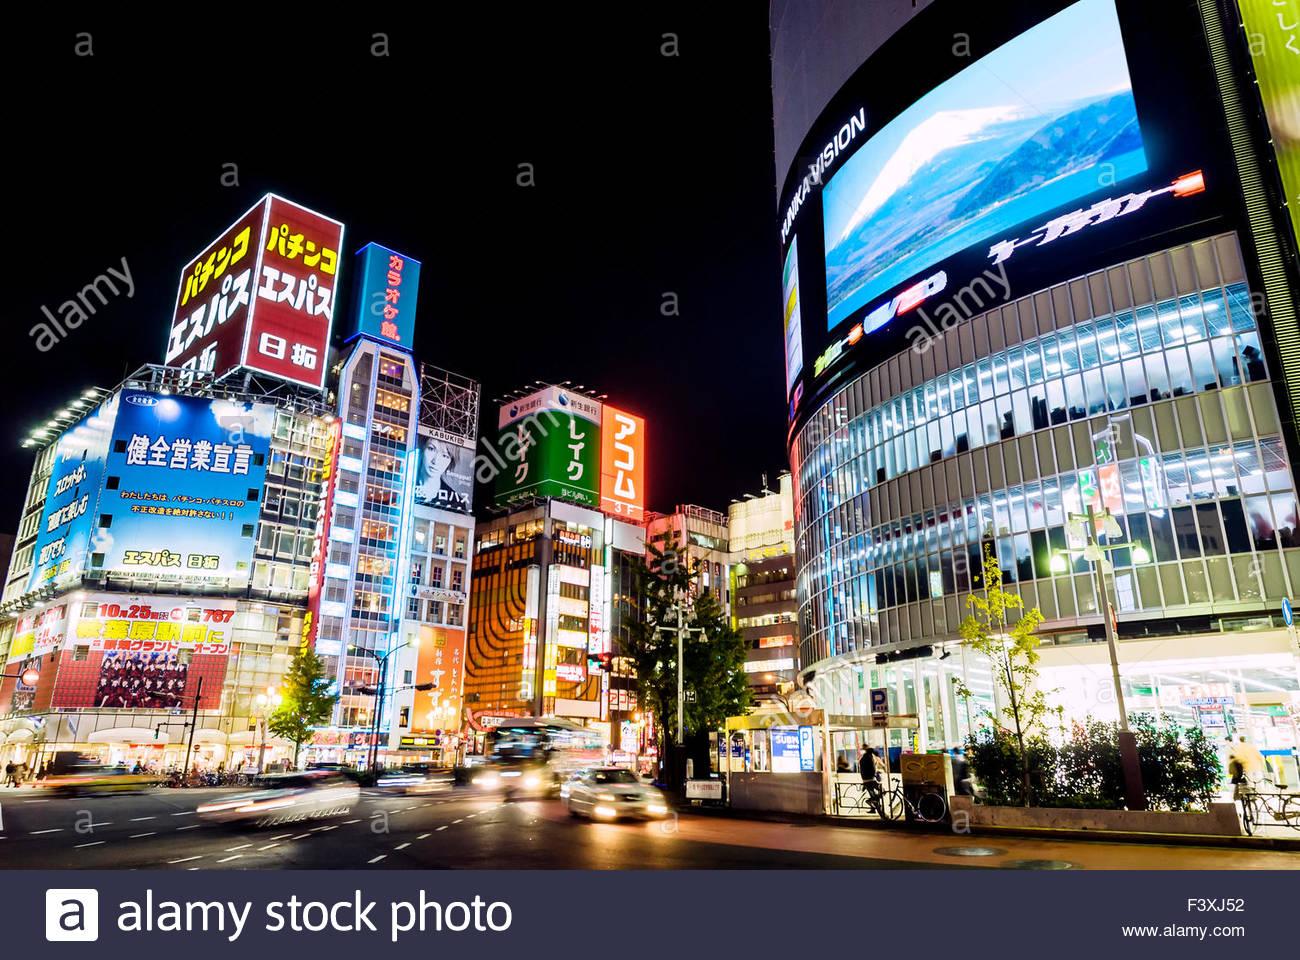 Yasukuni Dori Shinjuku Japan - Stock Image